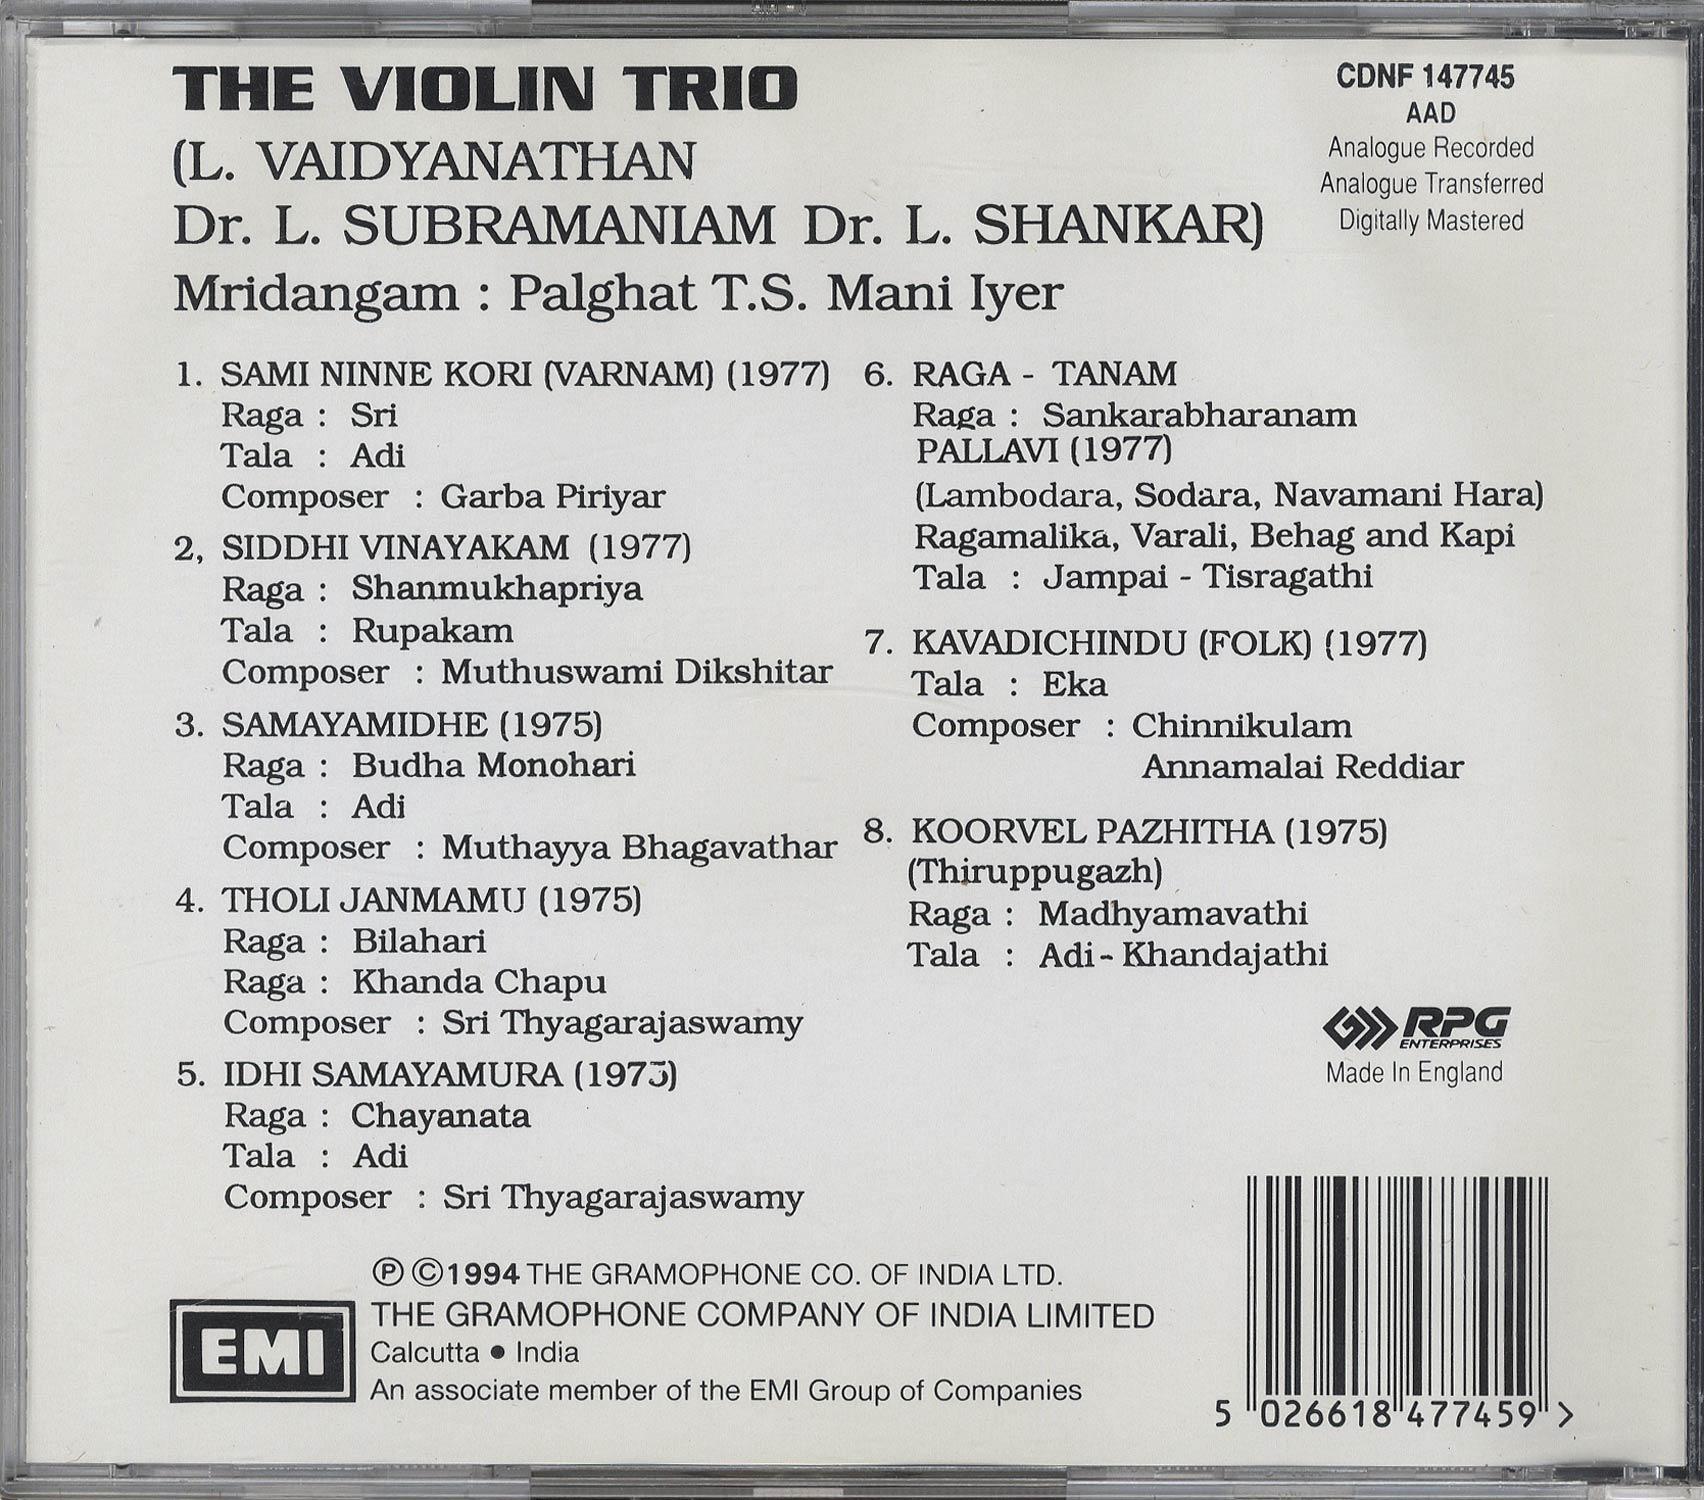 The Violin Trio[image2]